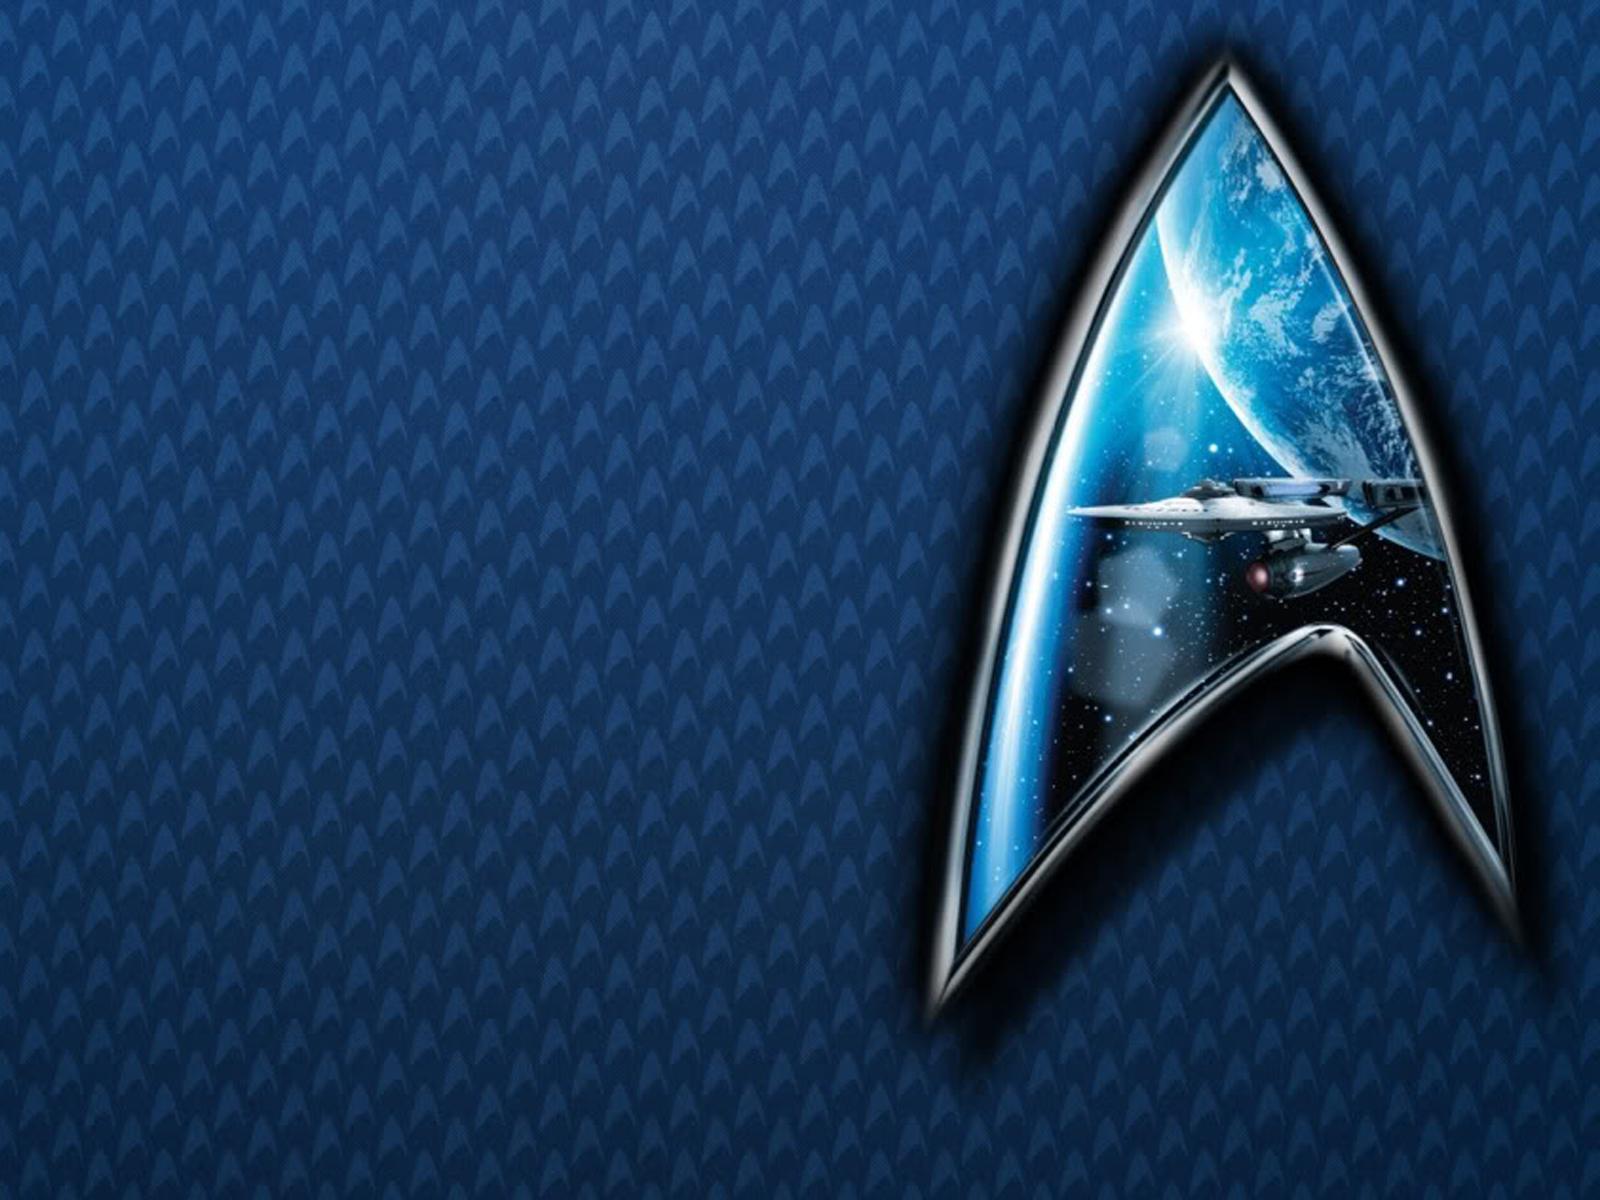 Insignia Star Trek computer desktop wallpaper pictures images 1600x1200